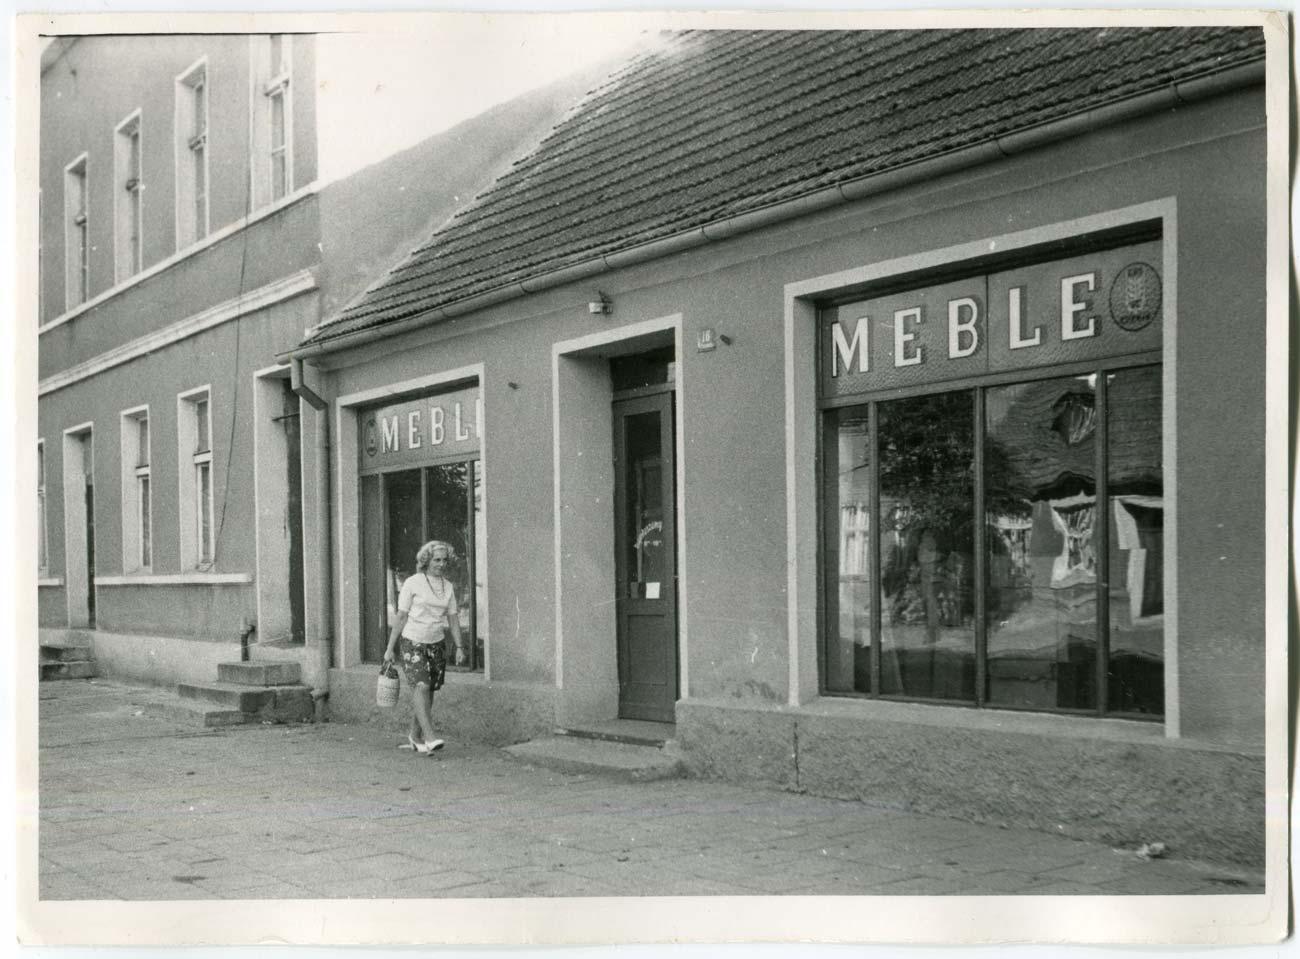 Sklep meblowy, Kórnik ul. Poznańska 16